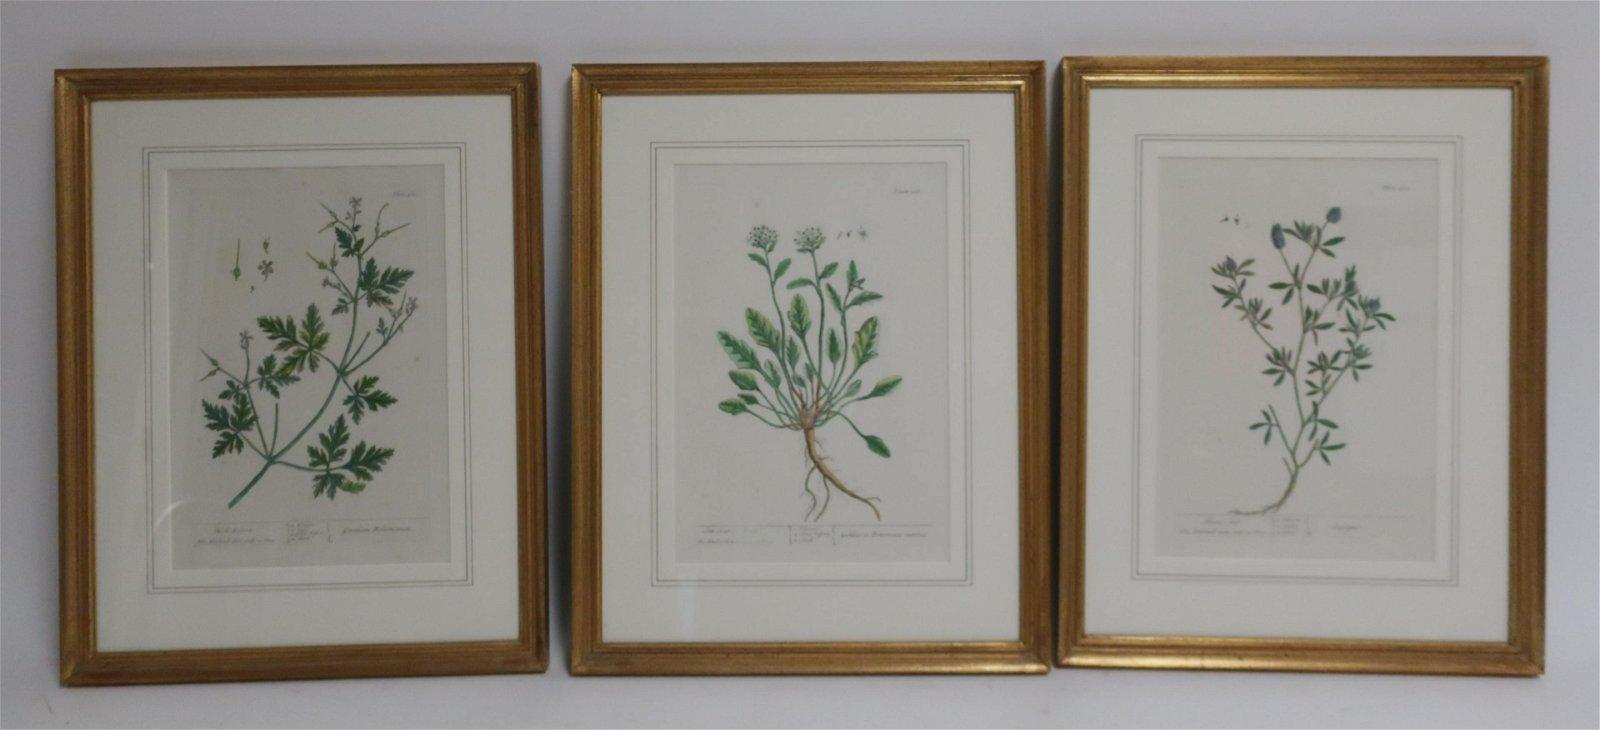 3 Botanical Handcolored Engraving Prints